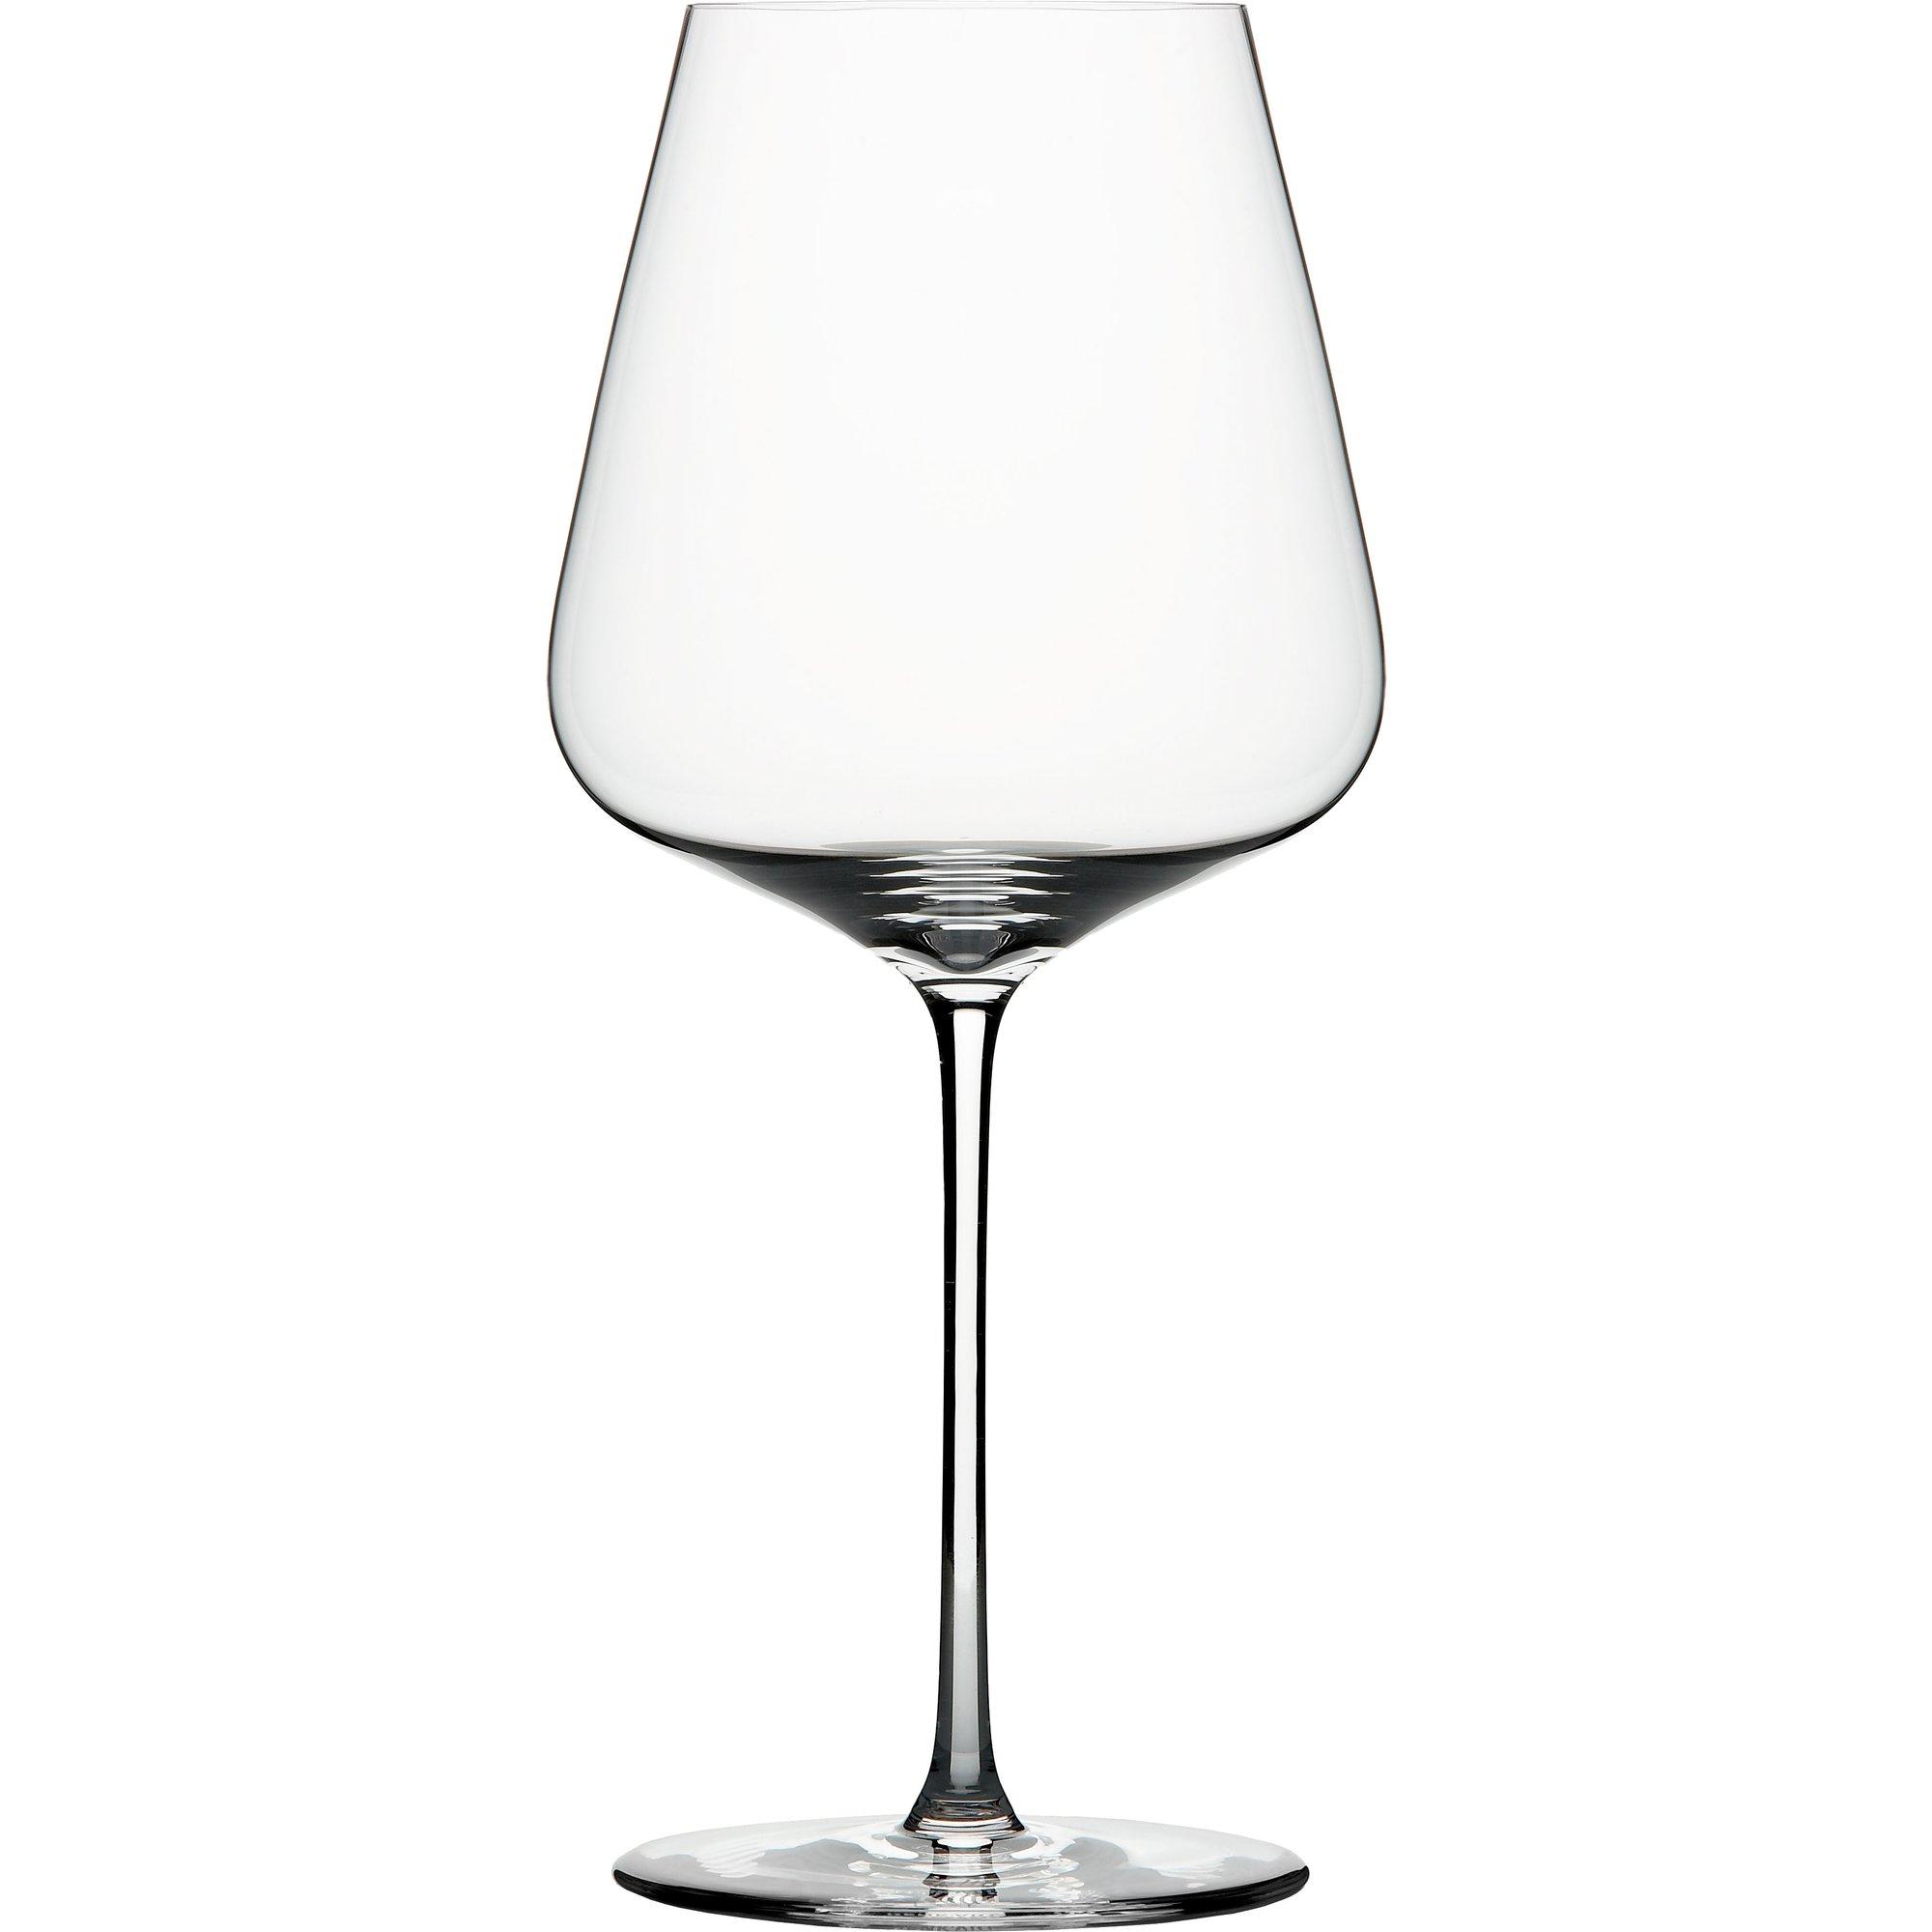 Zalto Bordeaux vinglas 765 ml. 1 st.